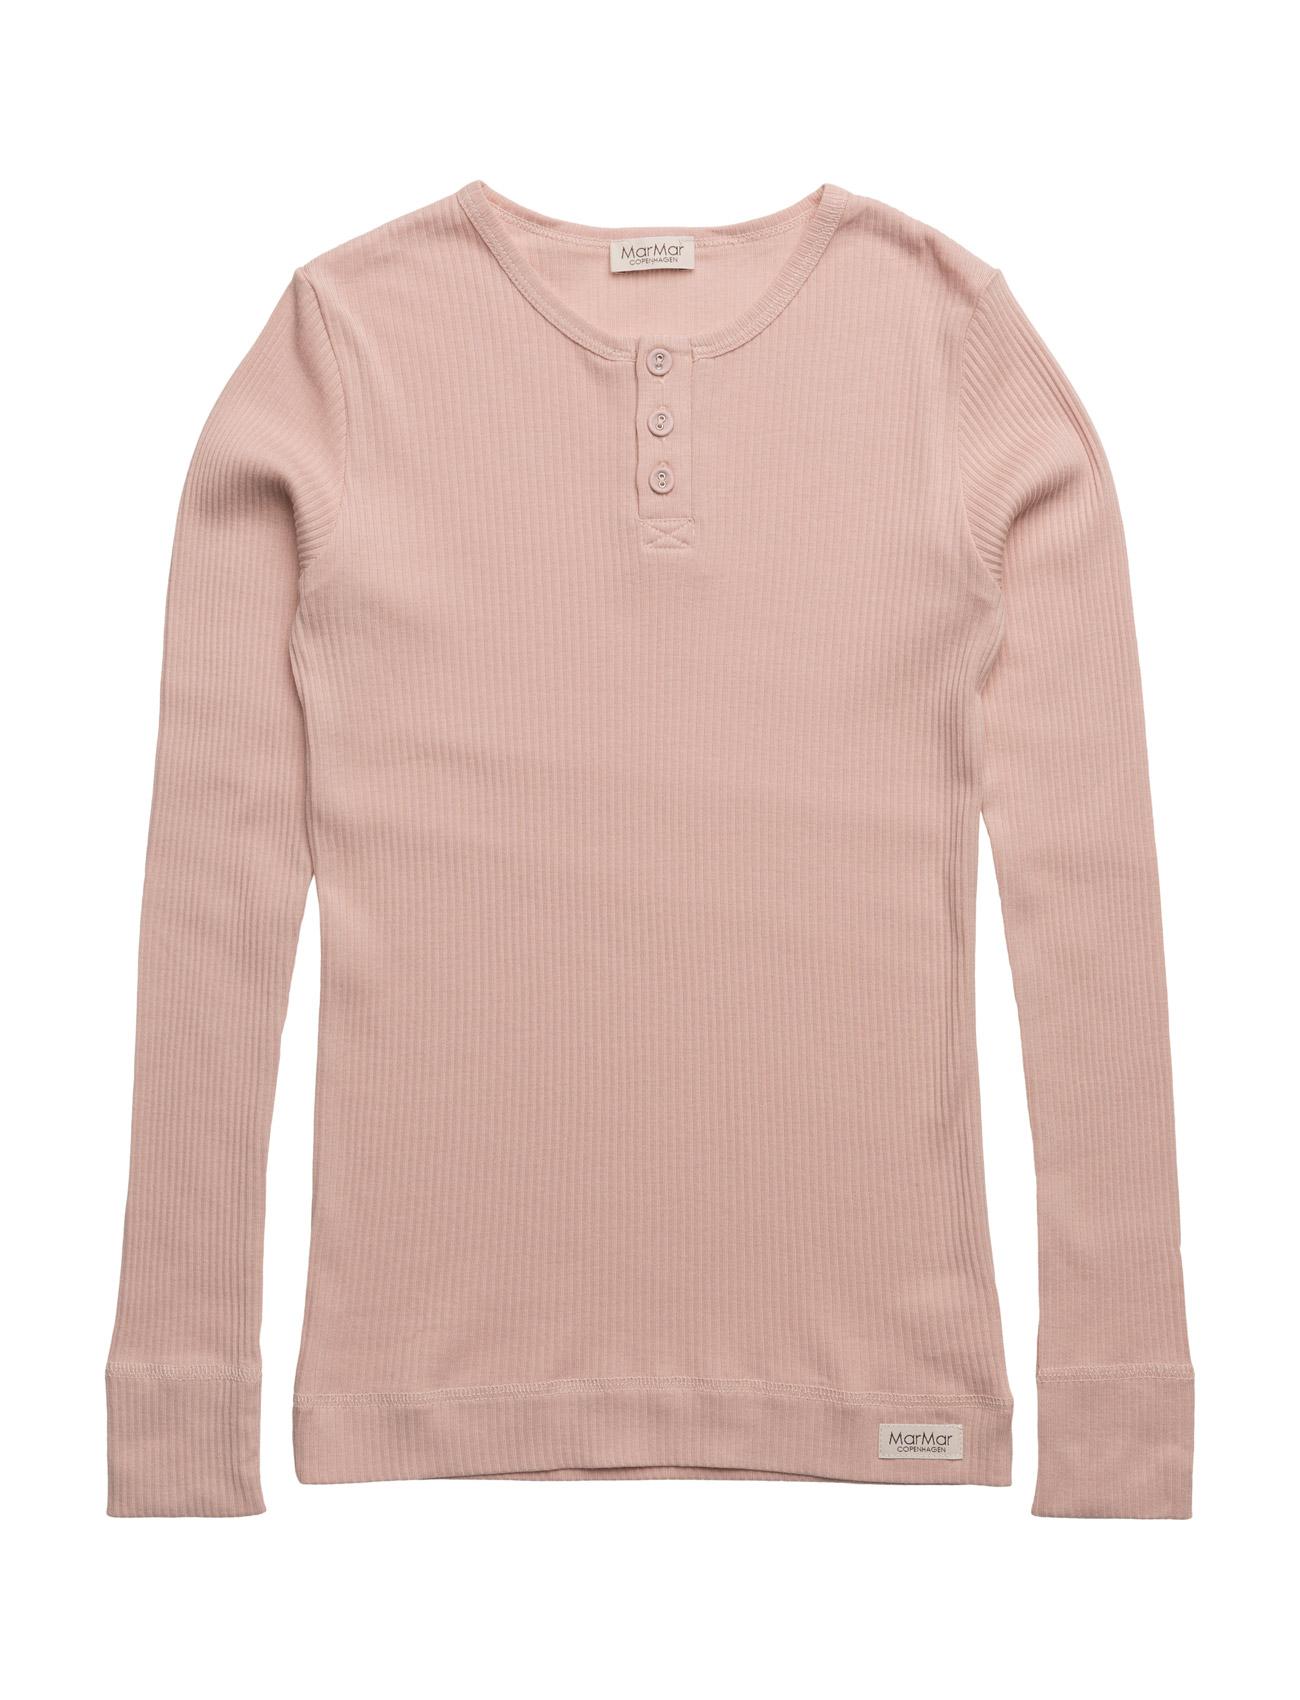 Tee Ls MarMar Cph T-shirts til Børn i Rose